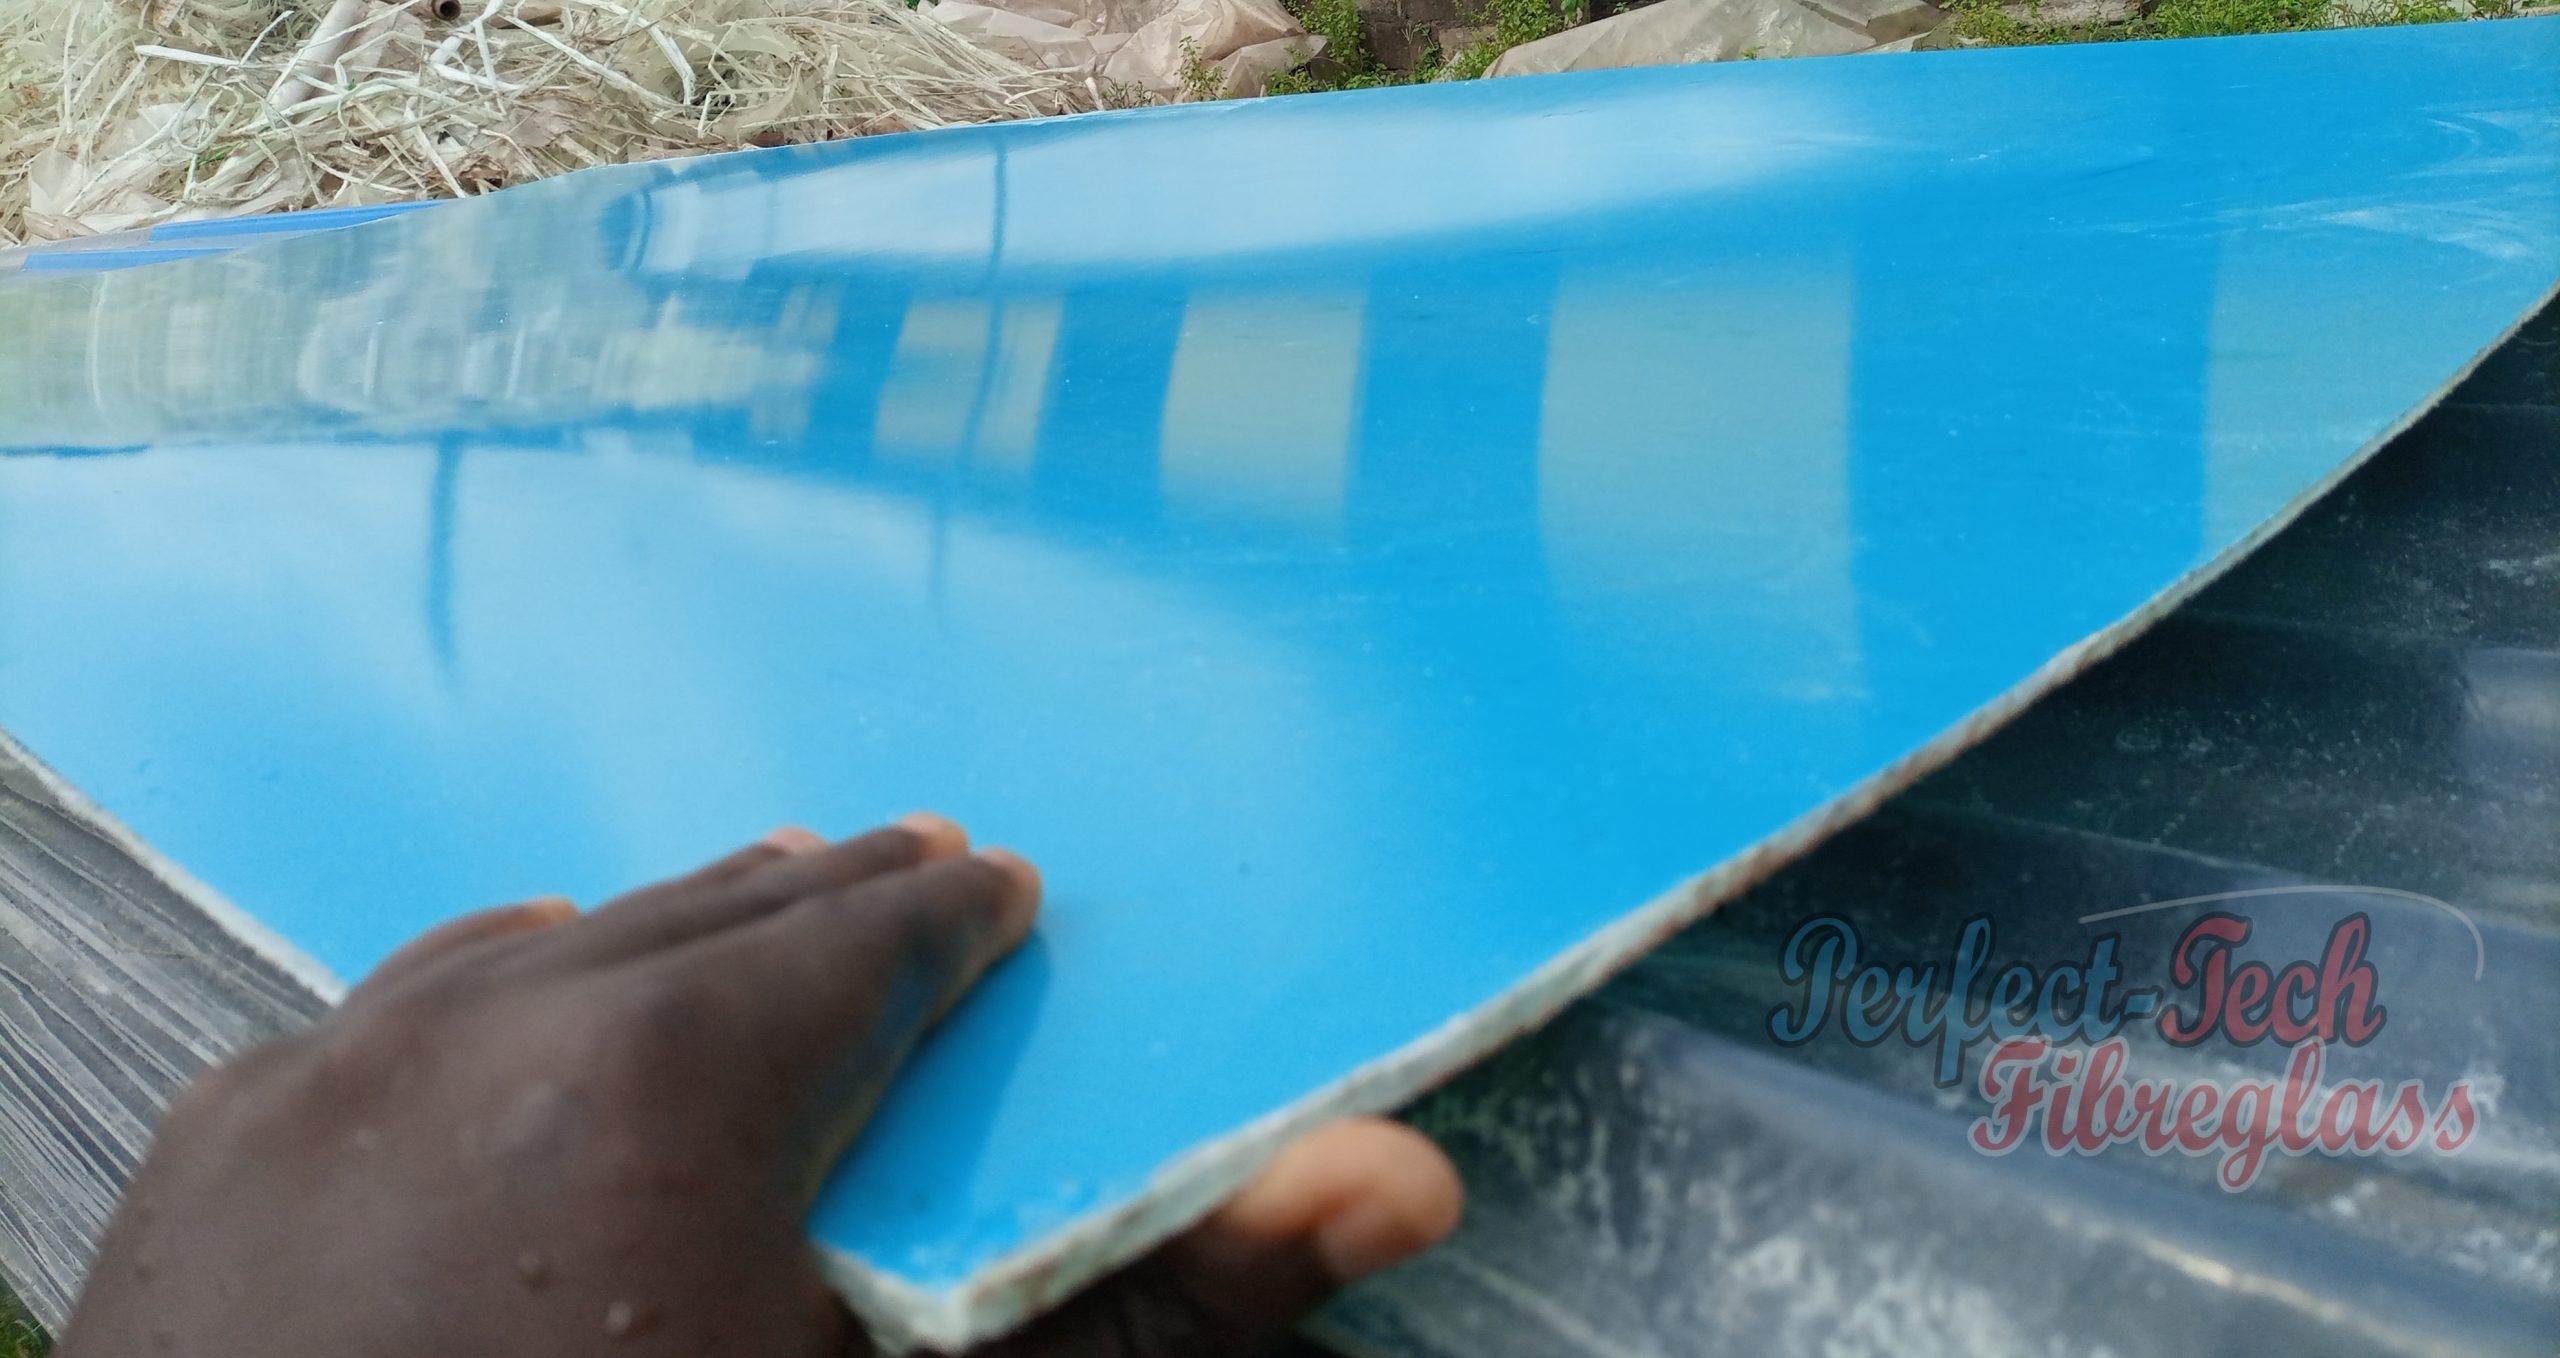 Fiberglass boards or flat sheet